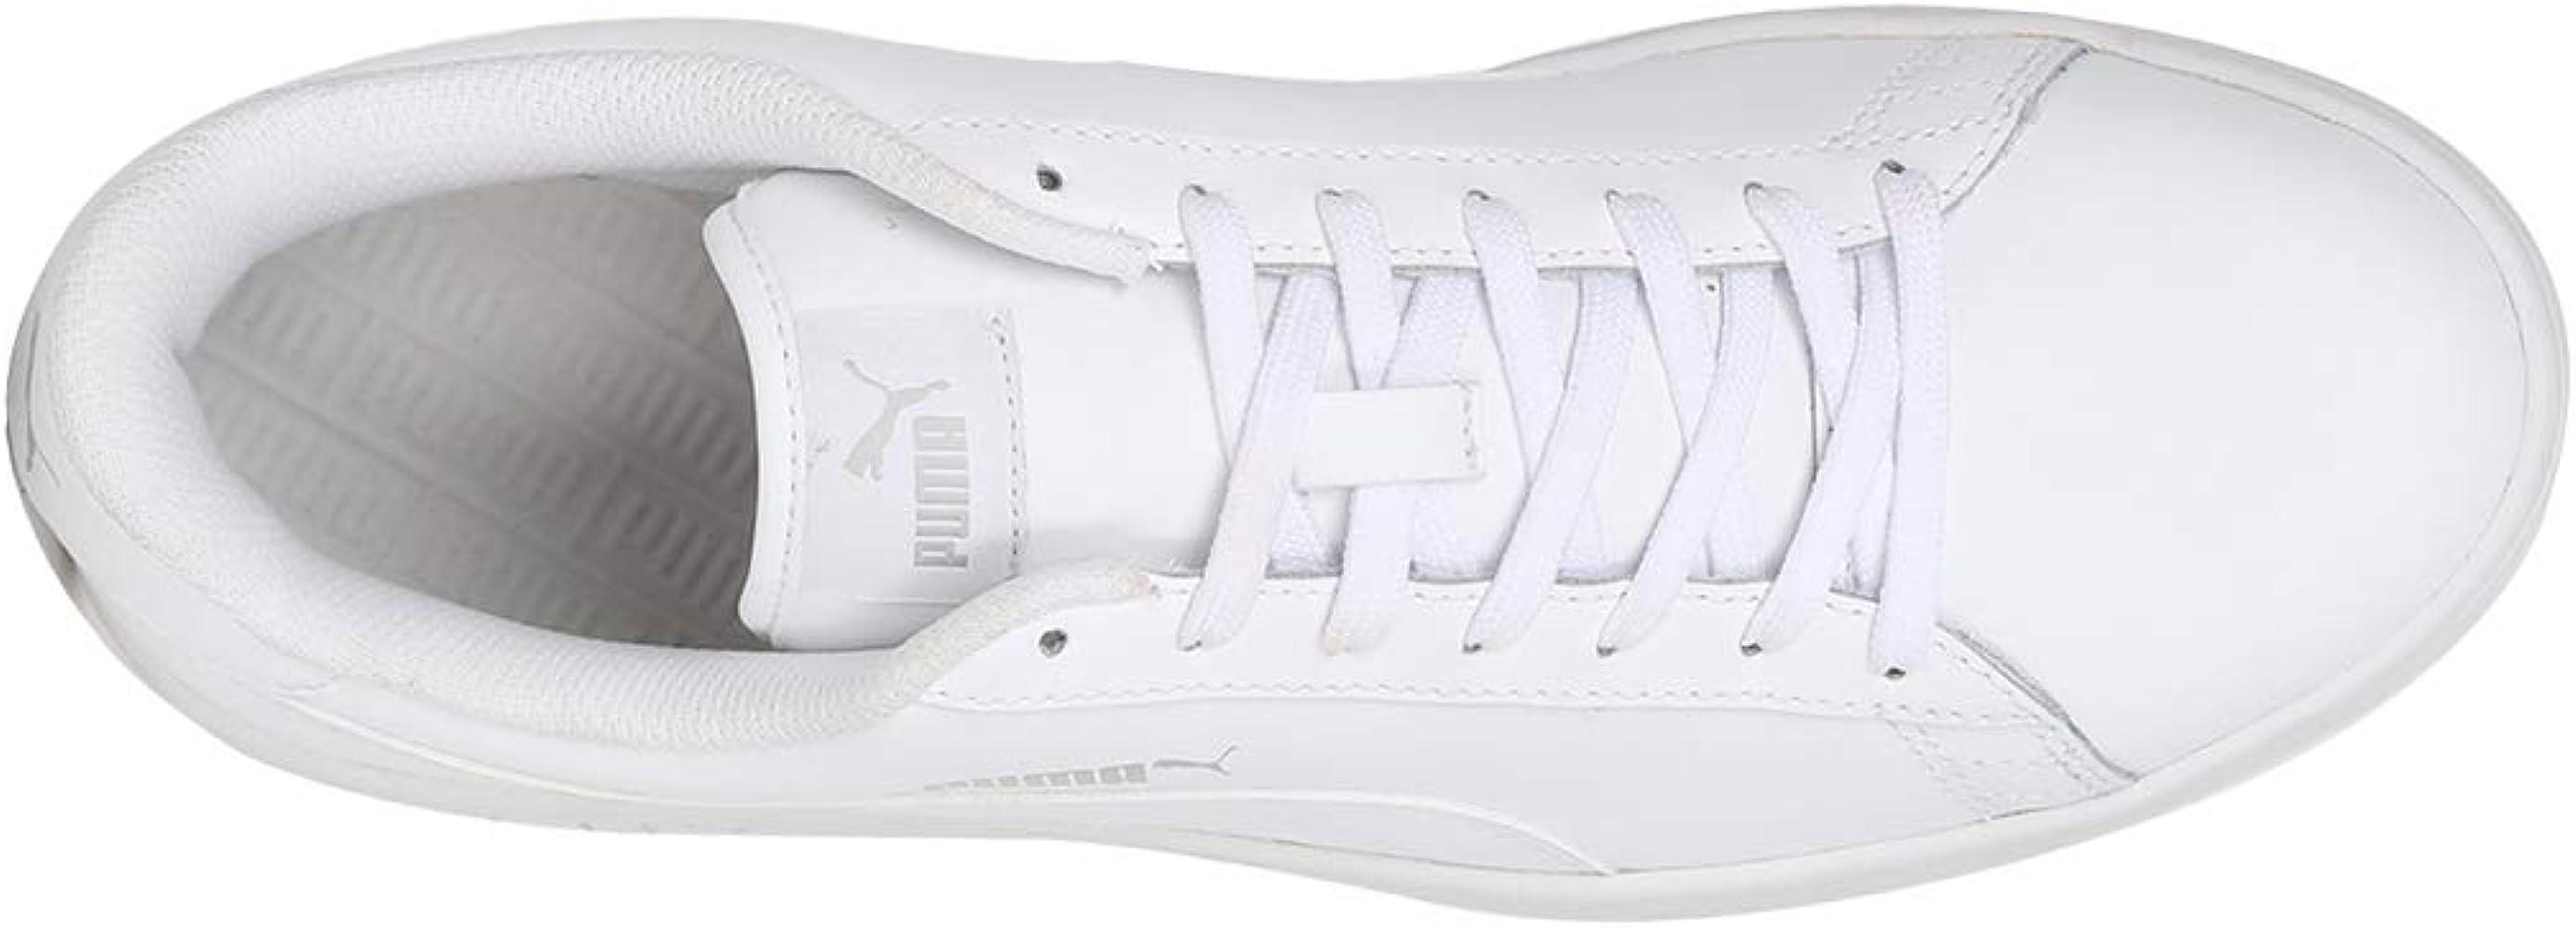 6718d2fef47d Puma Smash v2 Leather, Baskets de Cross mixte adulte, Blanc (Puma White)